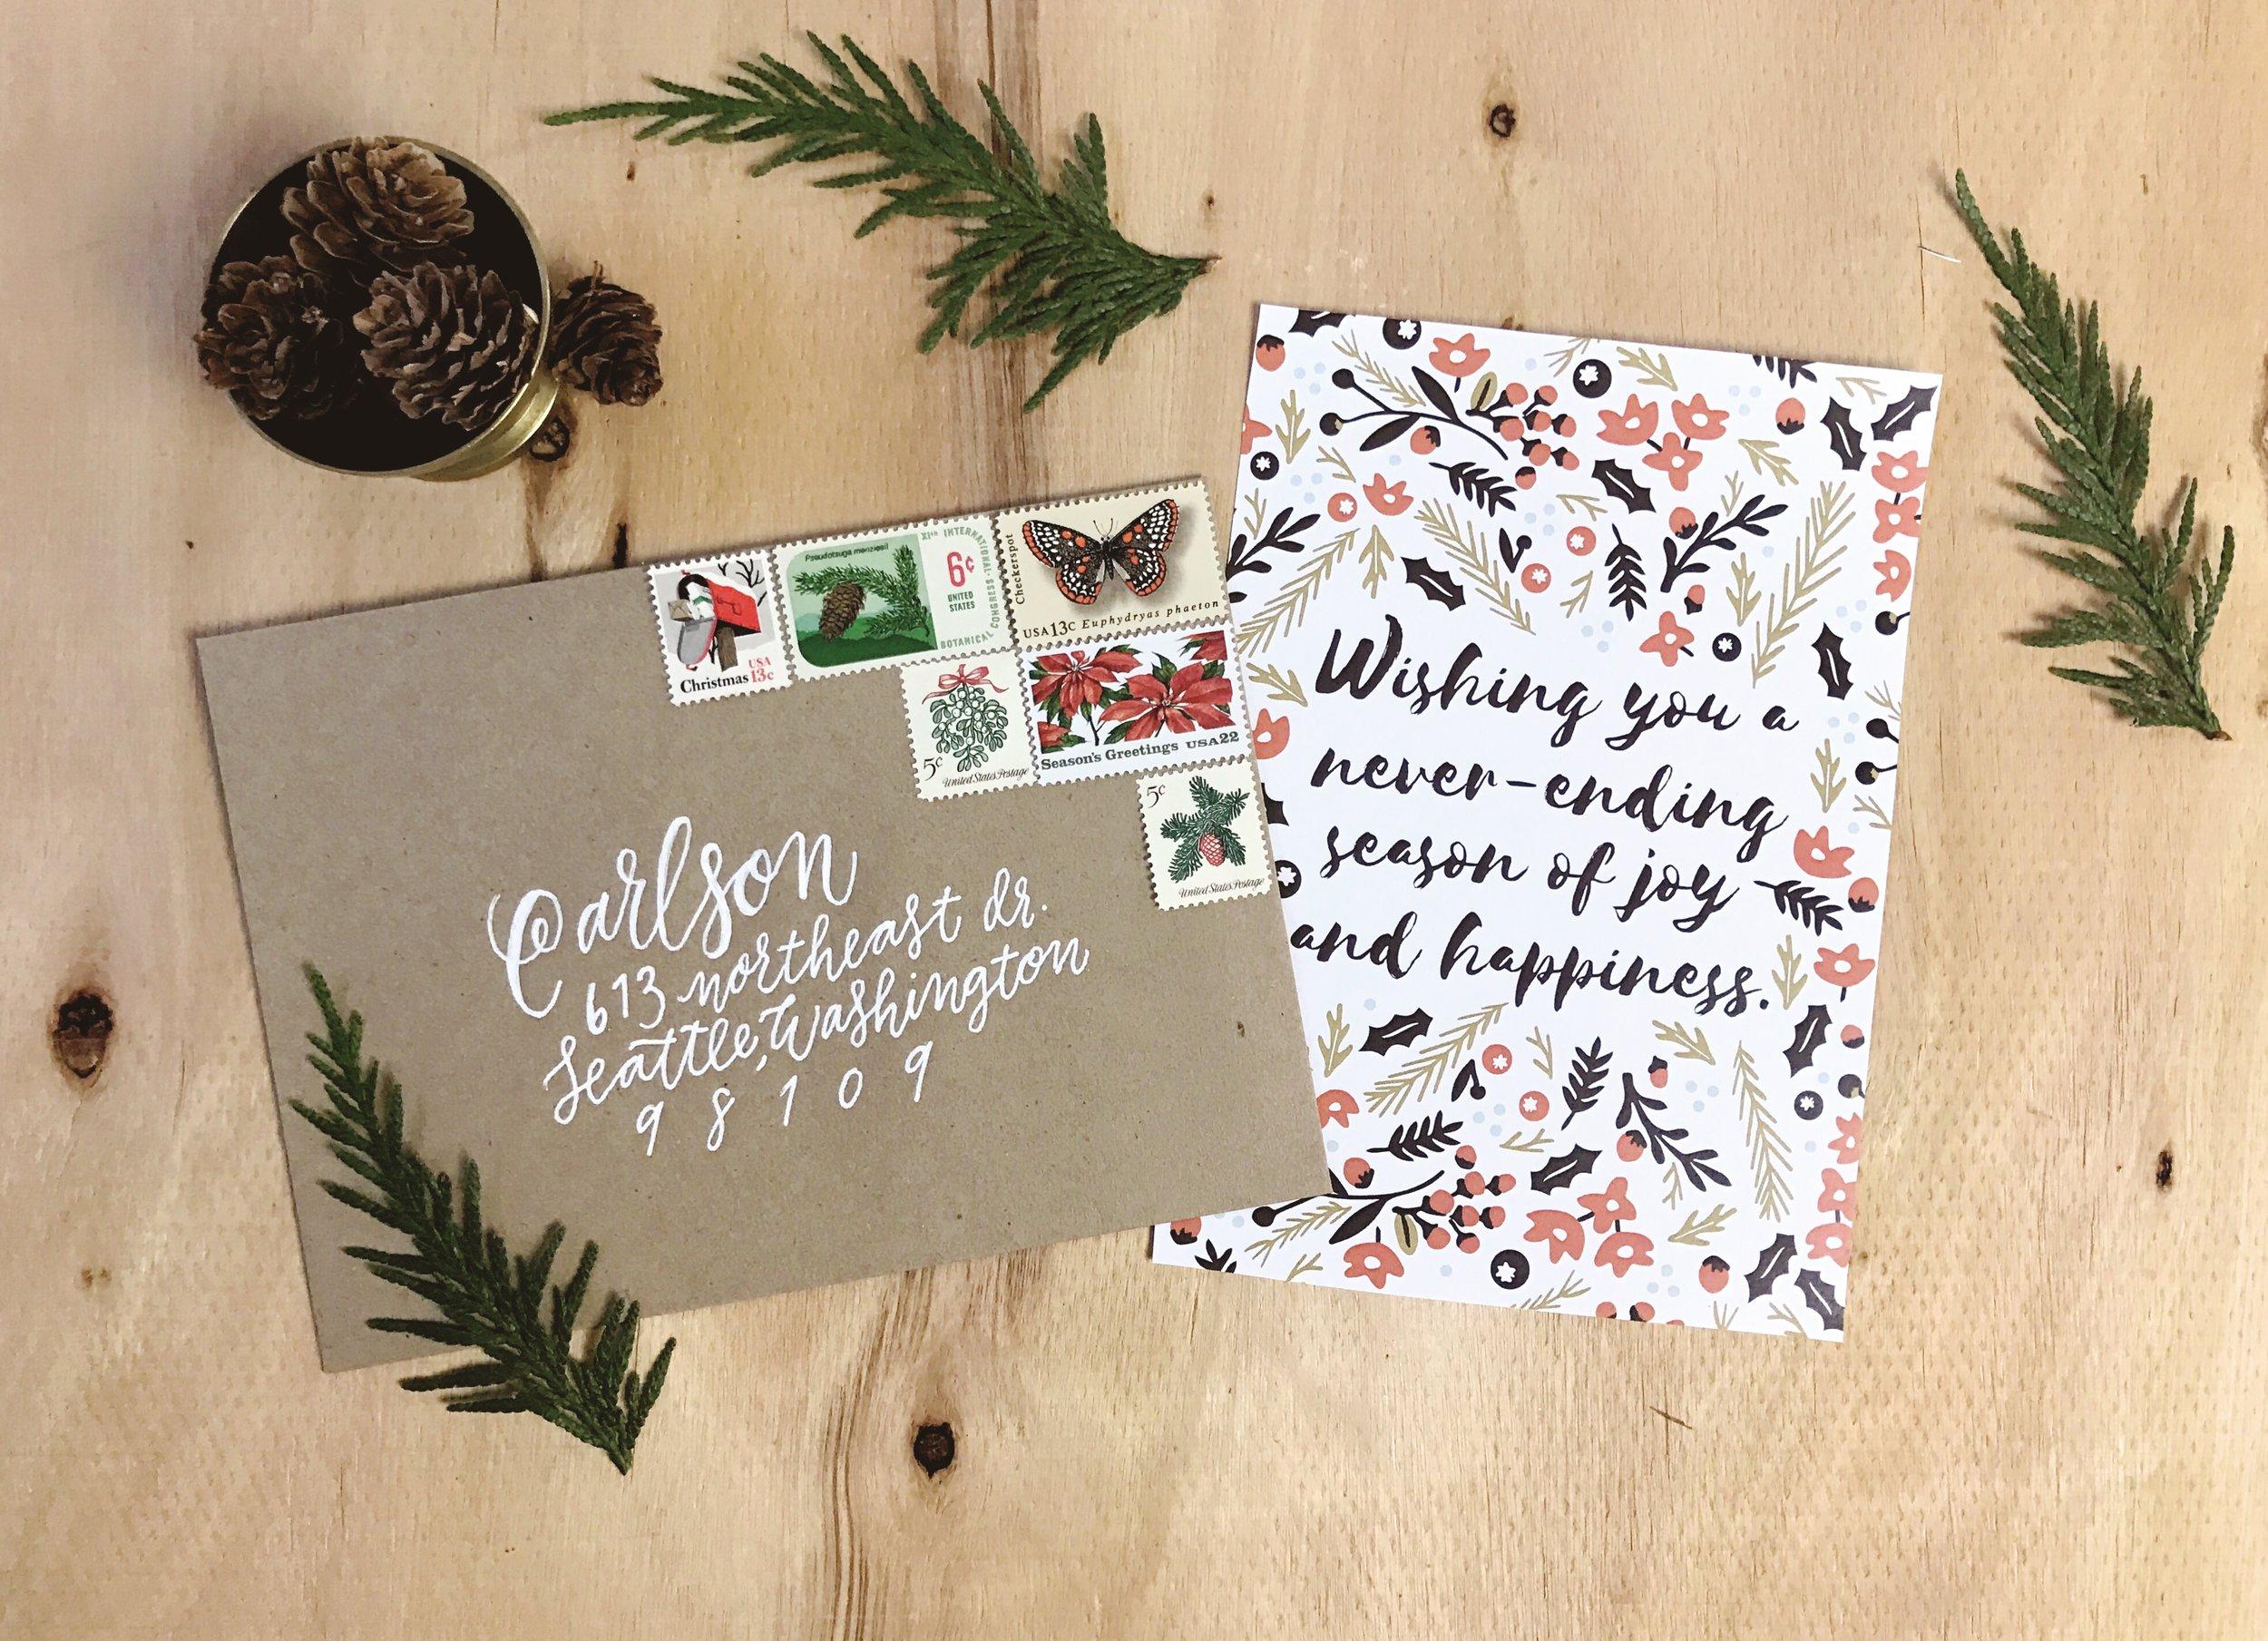 Original_Marabou-Design-DIY-Holiday-Card-Craft-Beauty-1.JPG